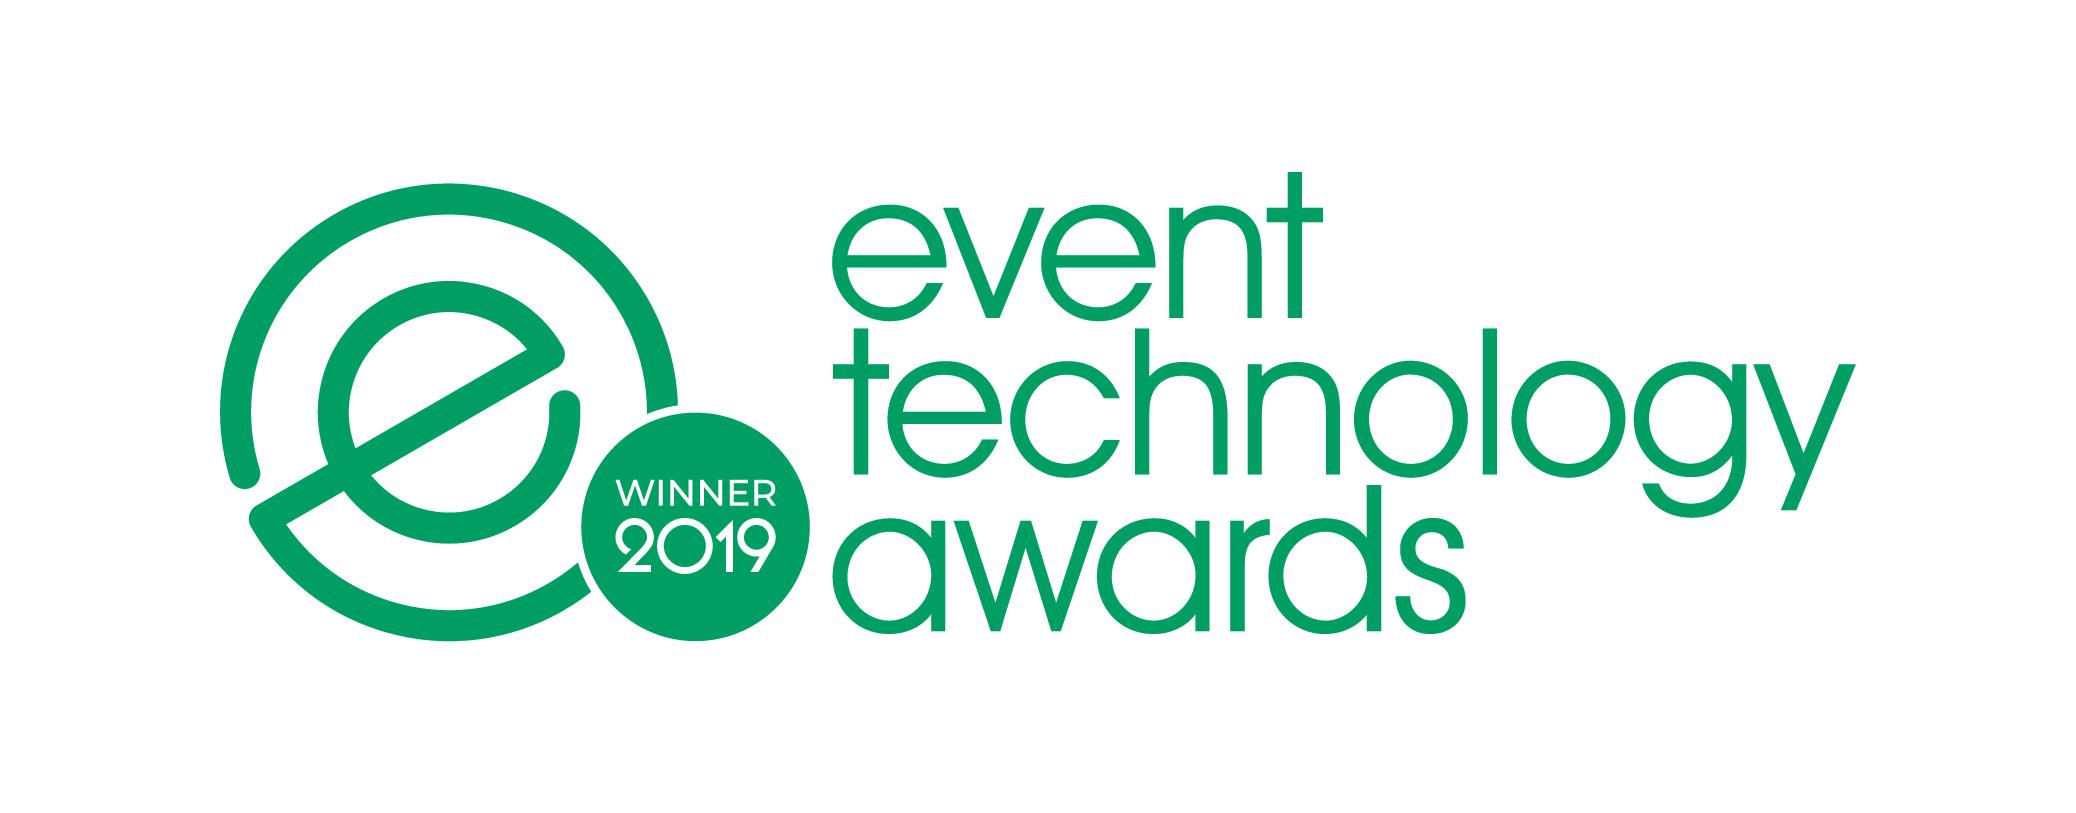 event technology award winner logo